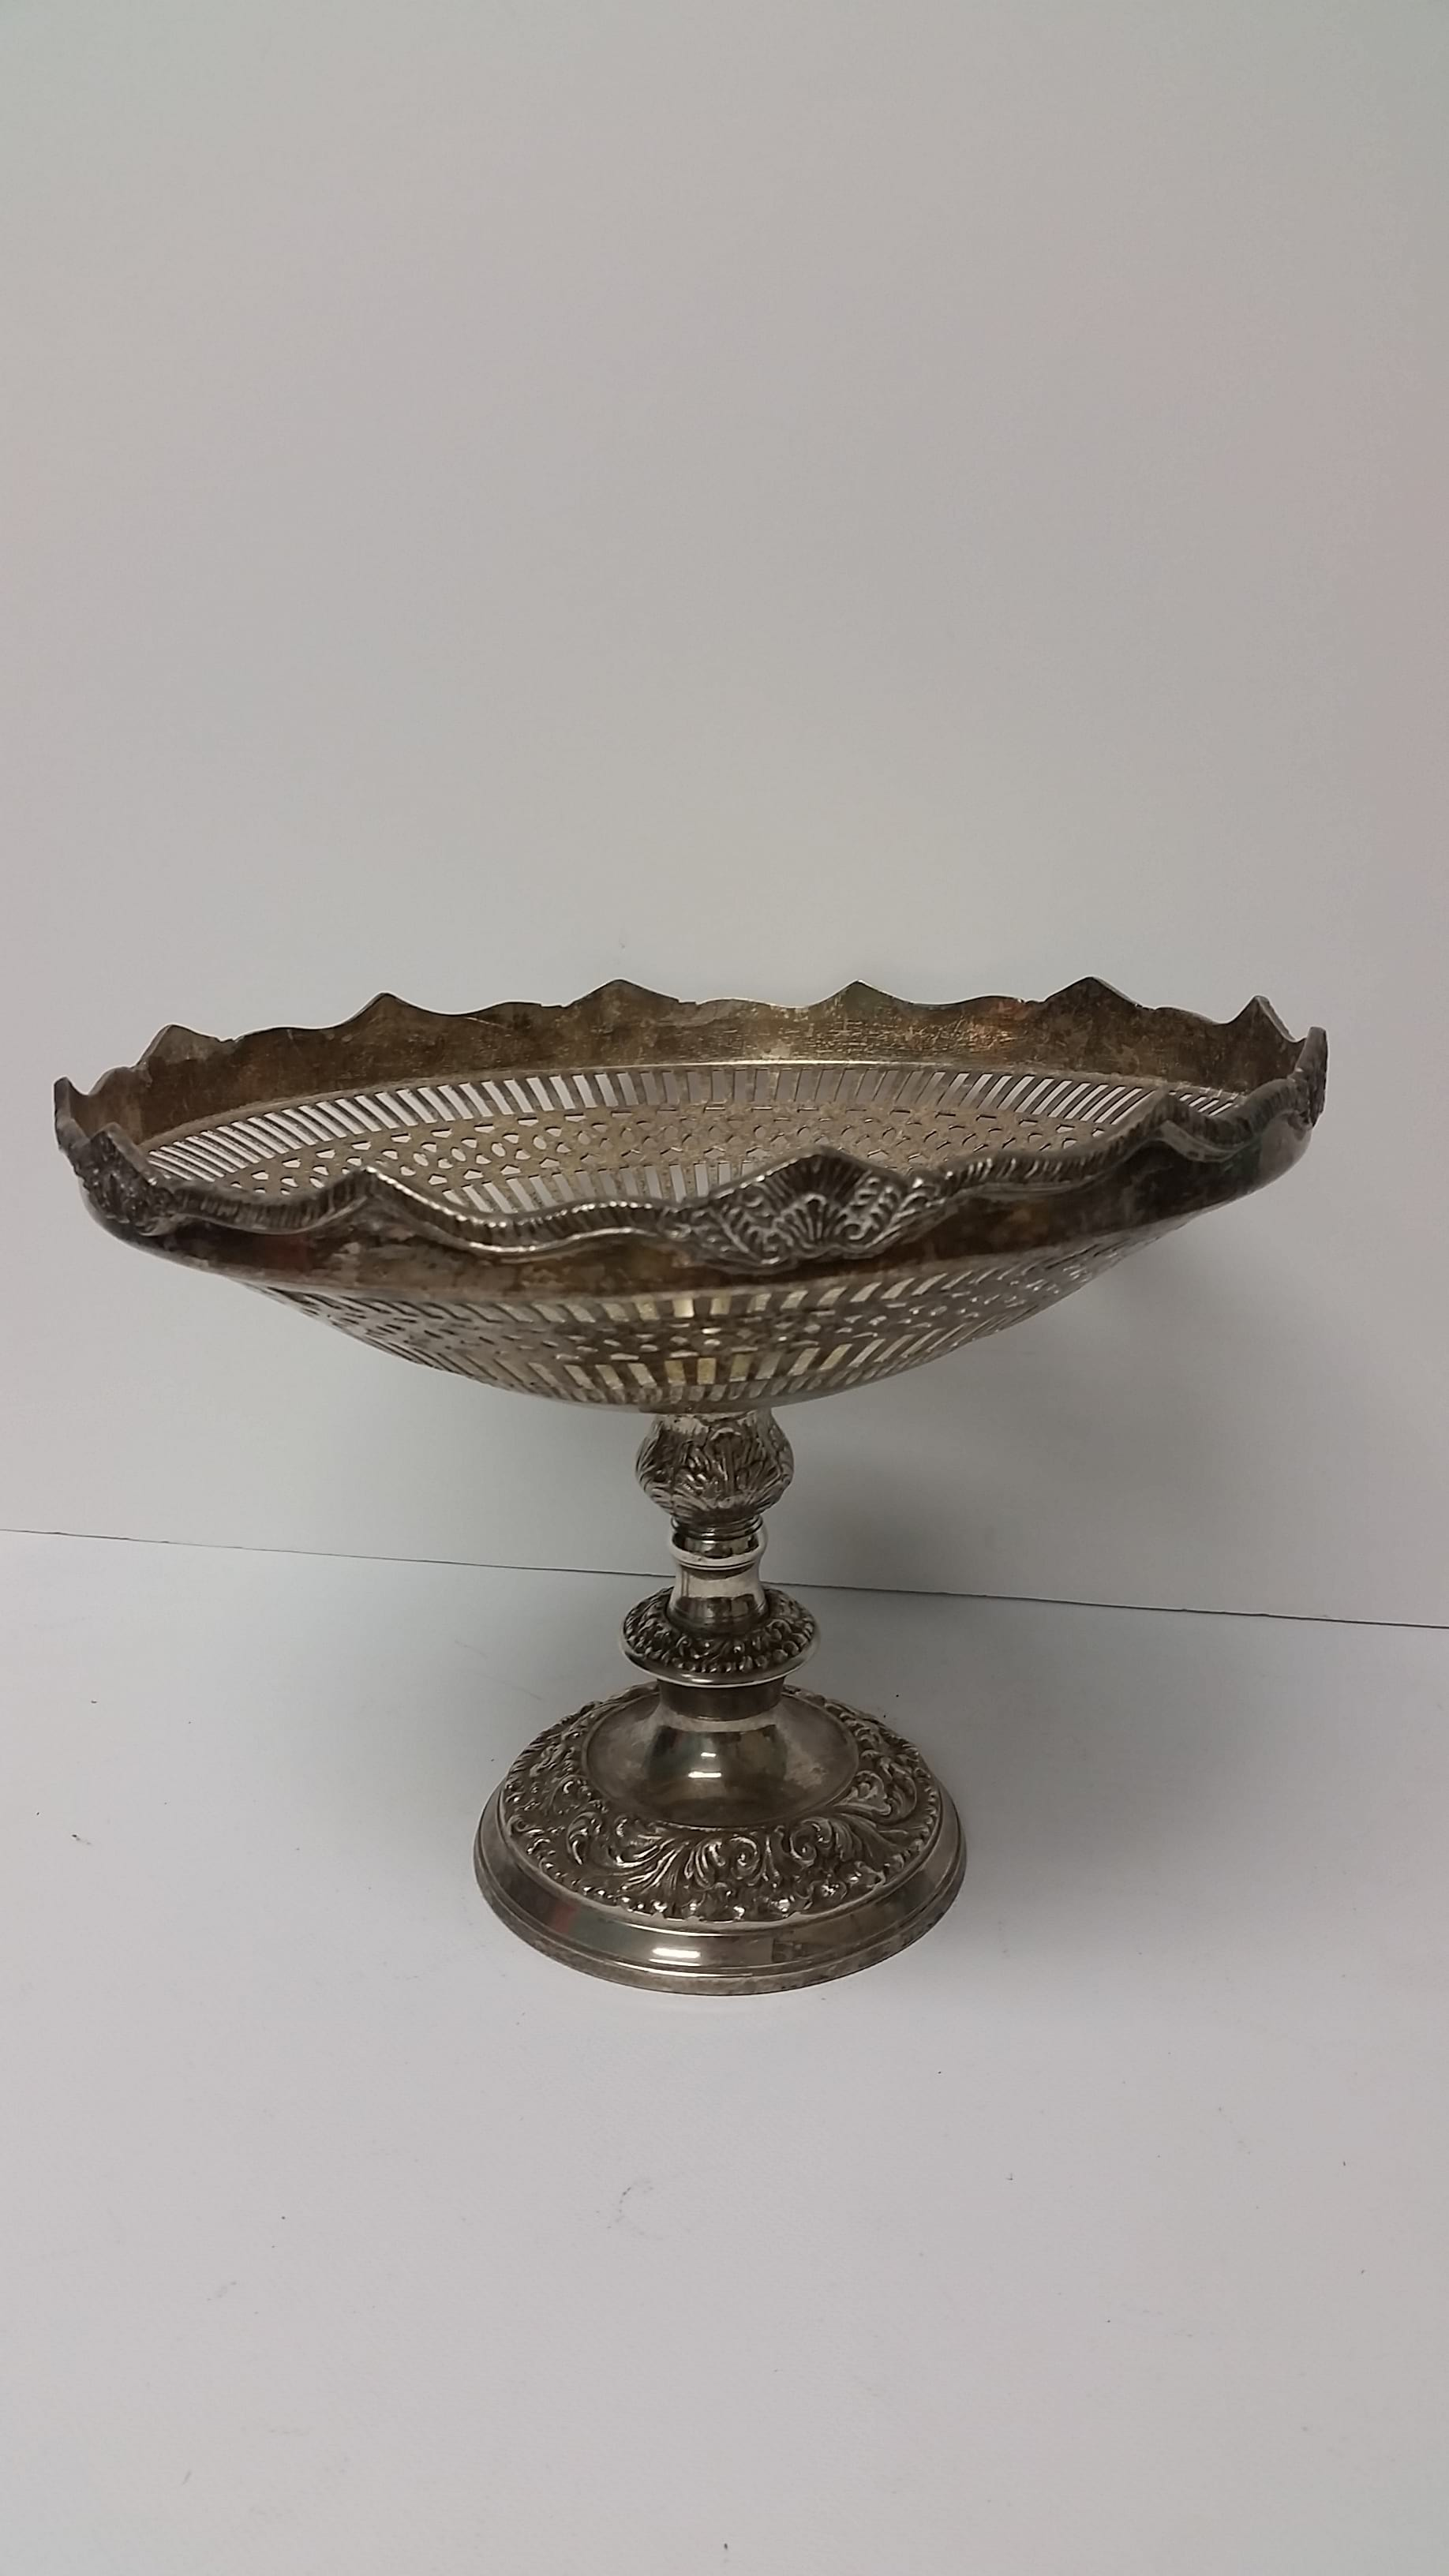 Candle Holder - Silver Pedestal Candlestick